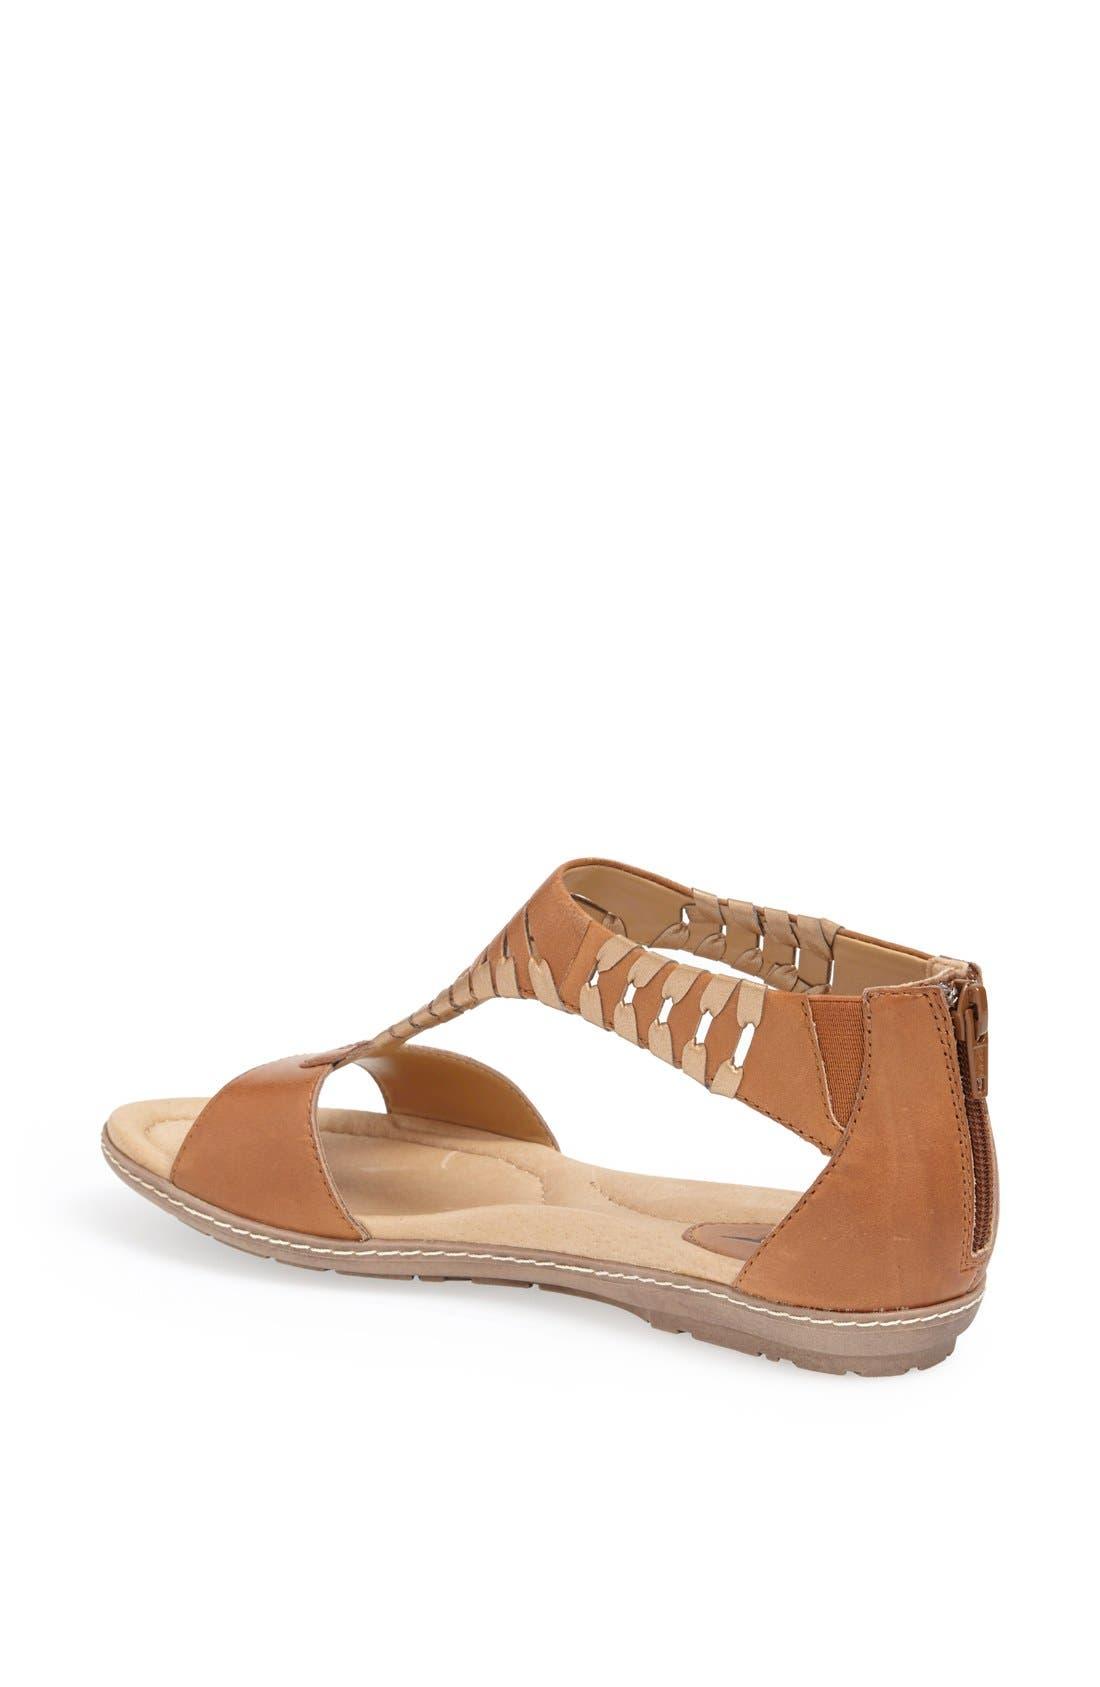 Alternate Image 2  - Earth® 'Shell' Cutout Leather Sandal